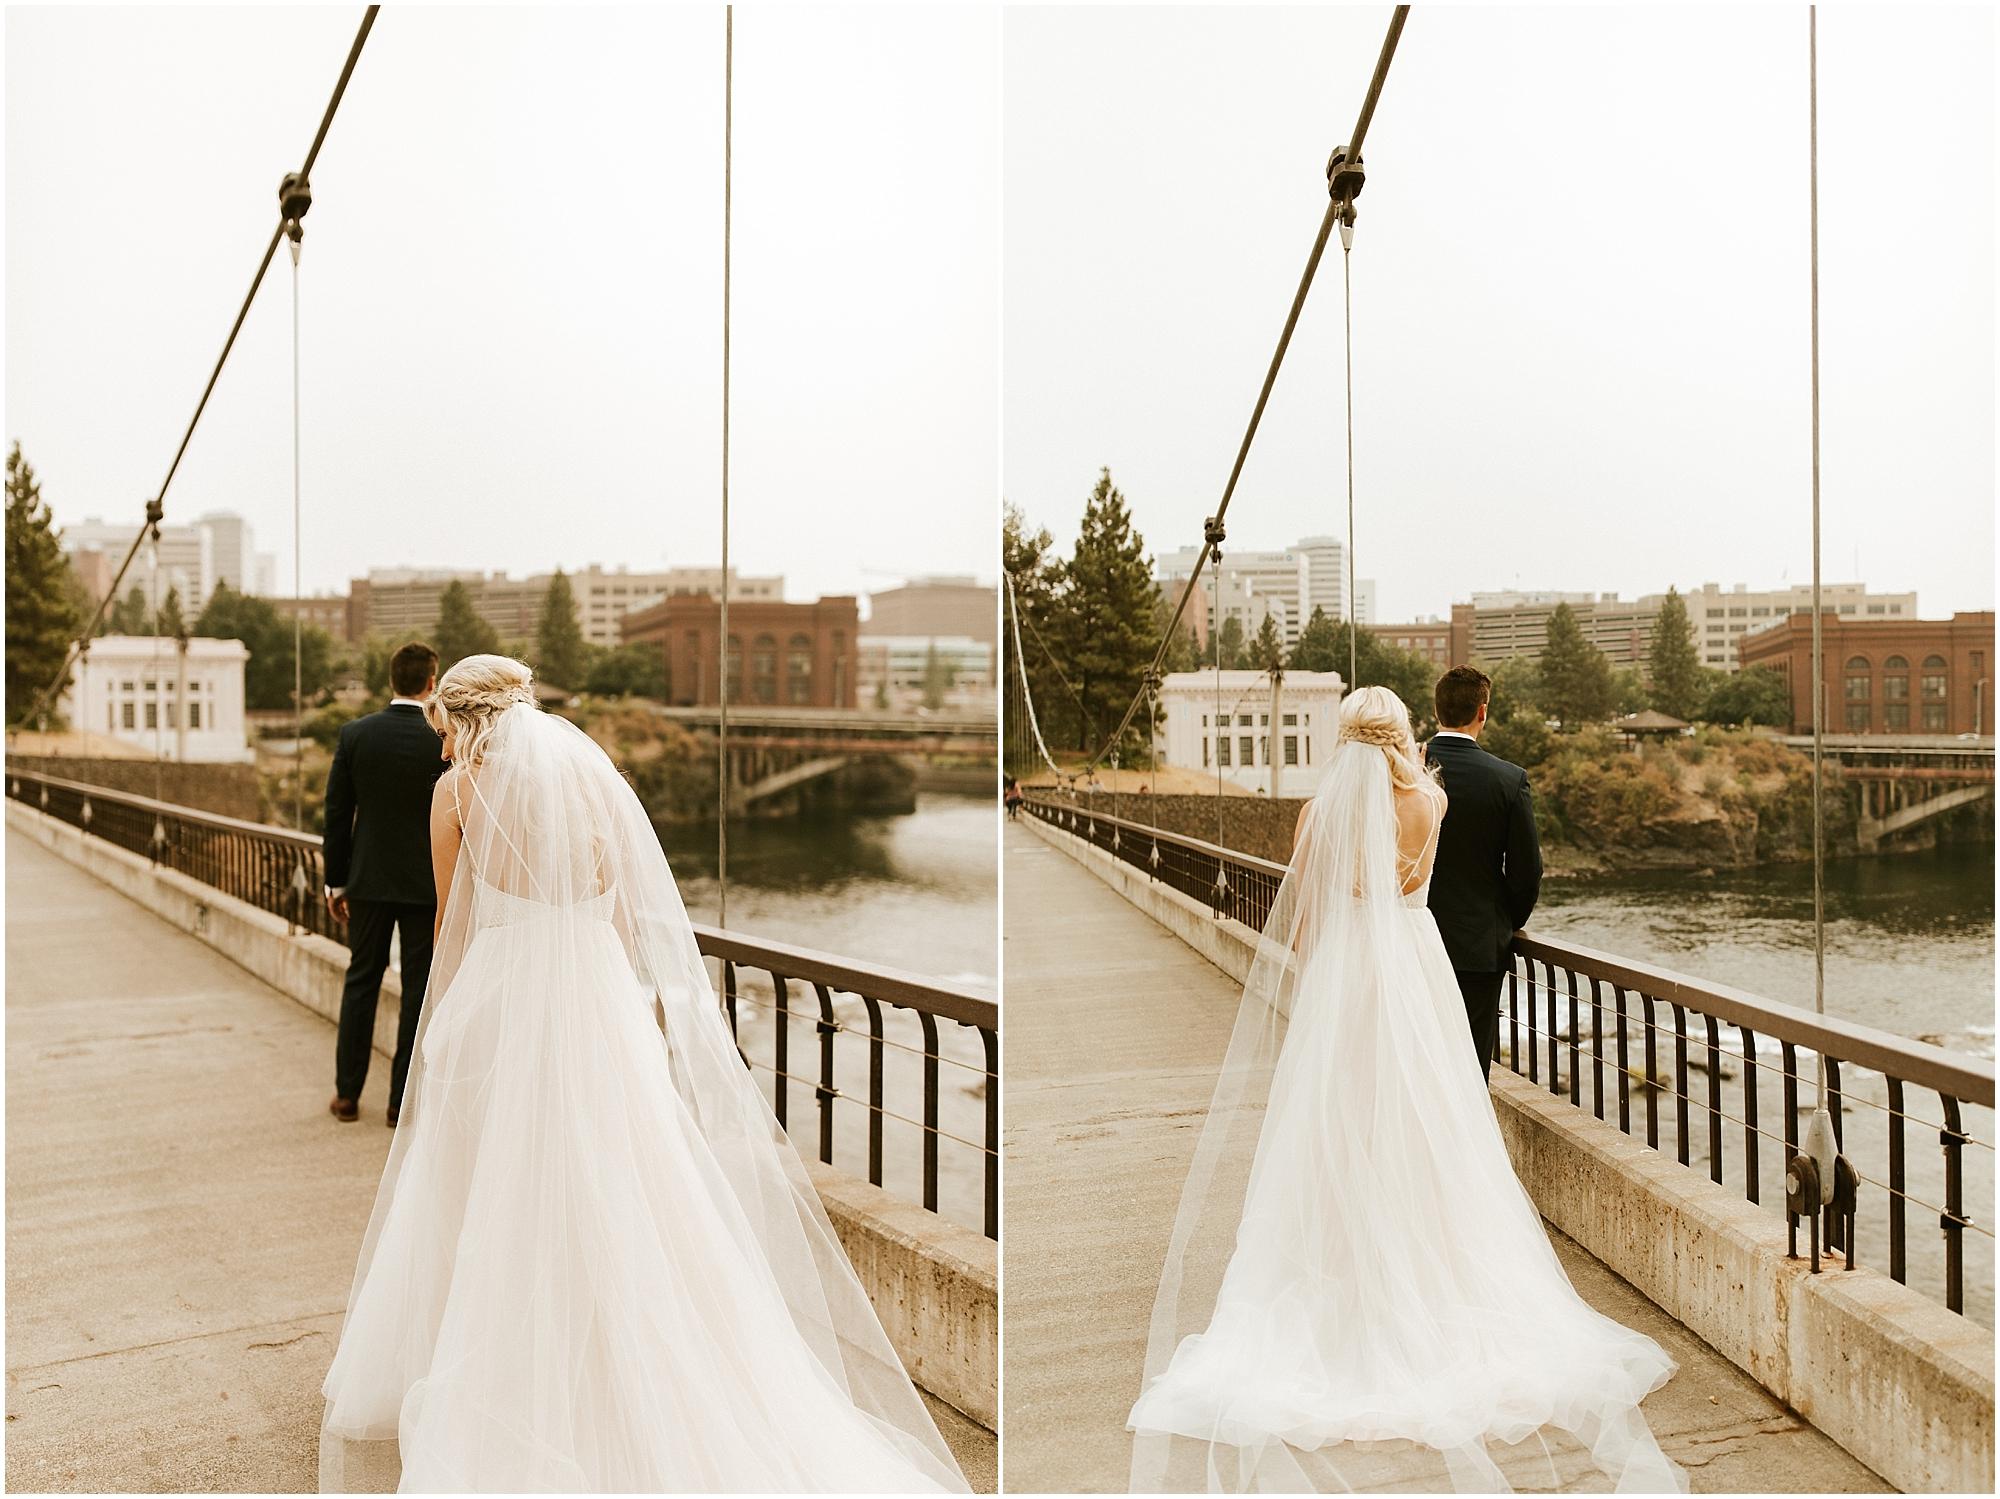 Chateau Rive Spokane Wedding Cassie Trottier Photography1022.jpg